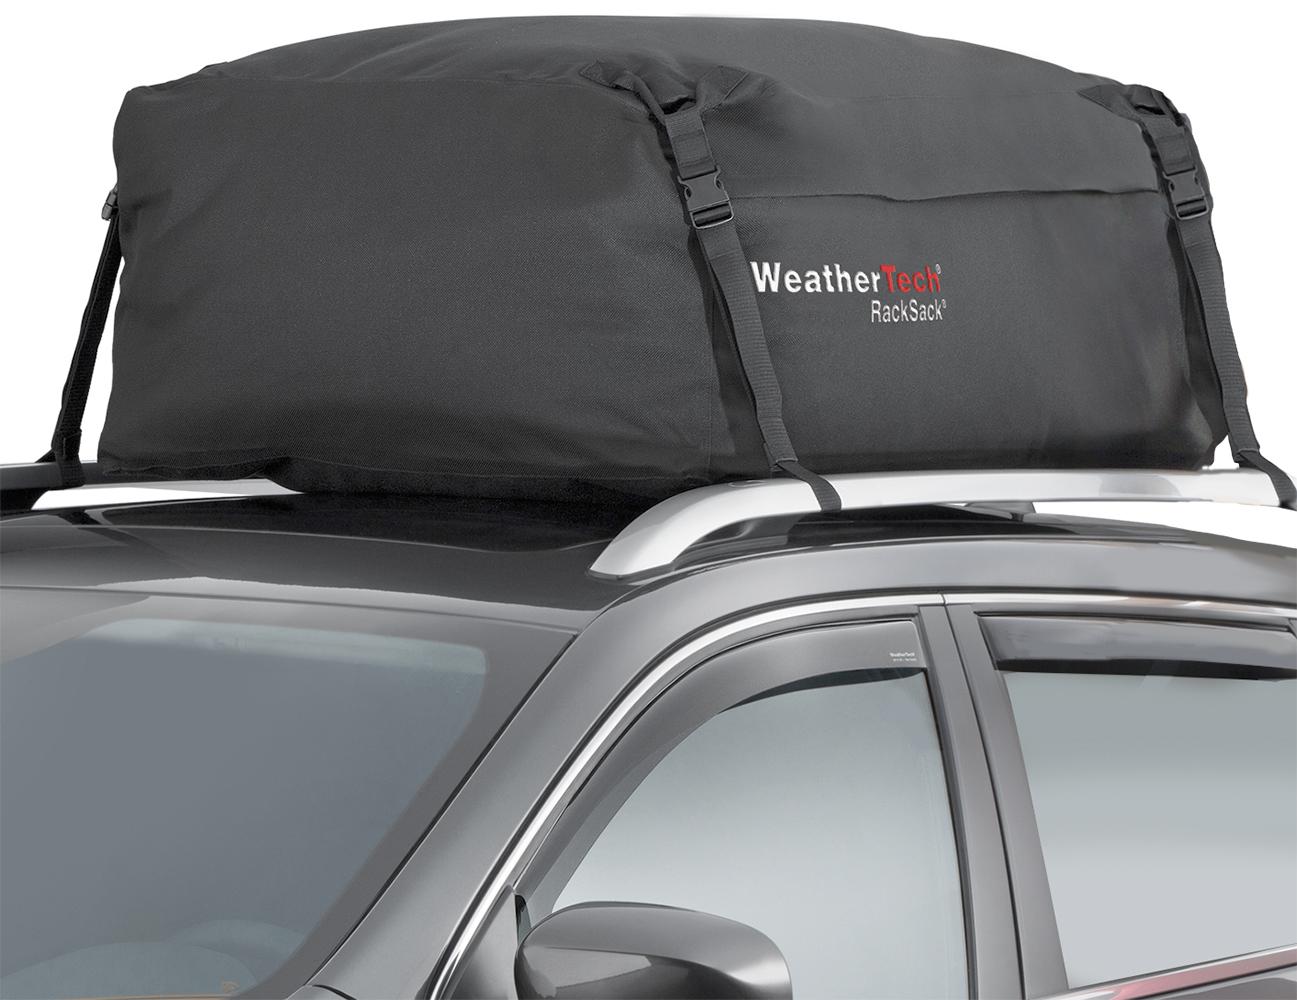 Weathertech Cargo Bags Weathertech Racksack Roof Cargo Bag